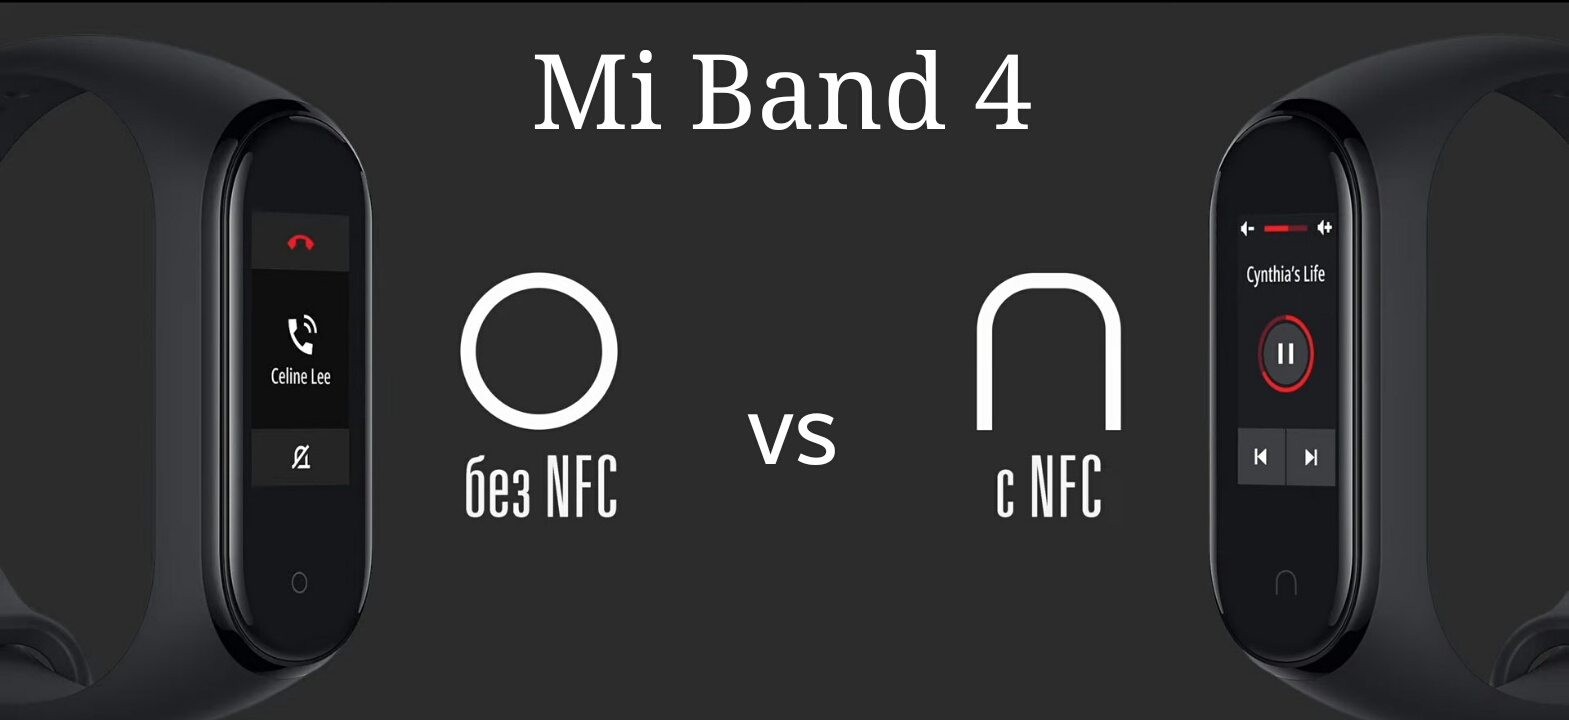 Отличие кнопок Mi Band 4